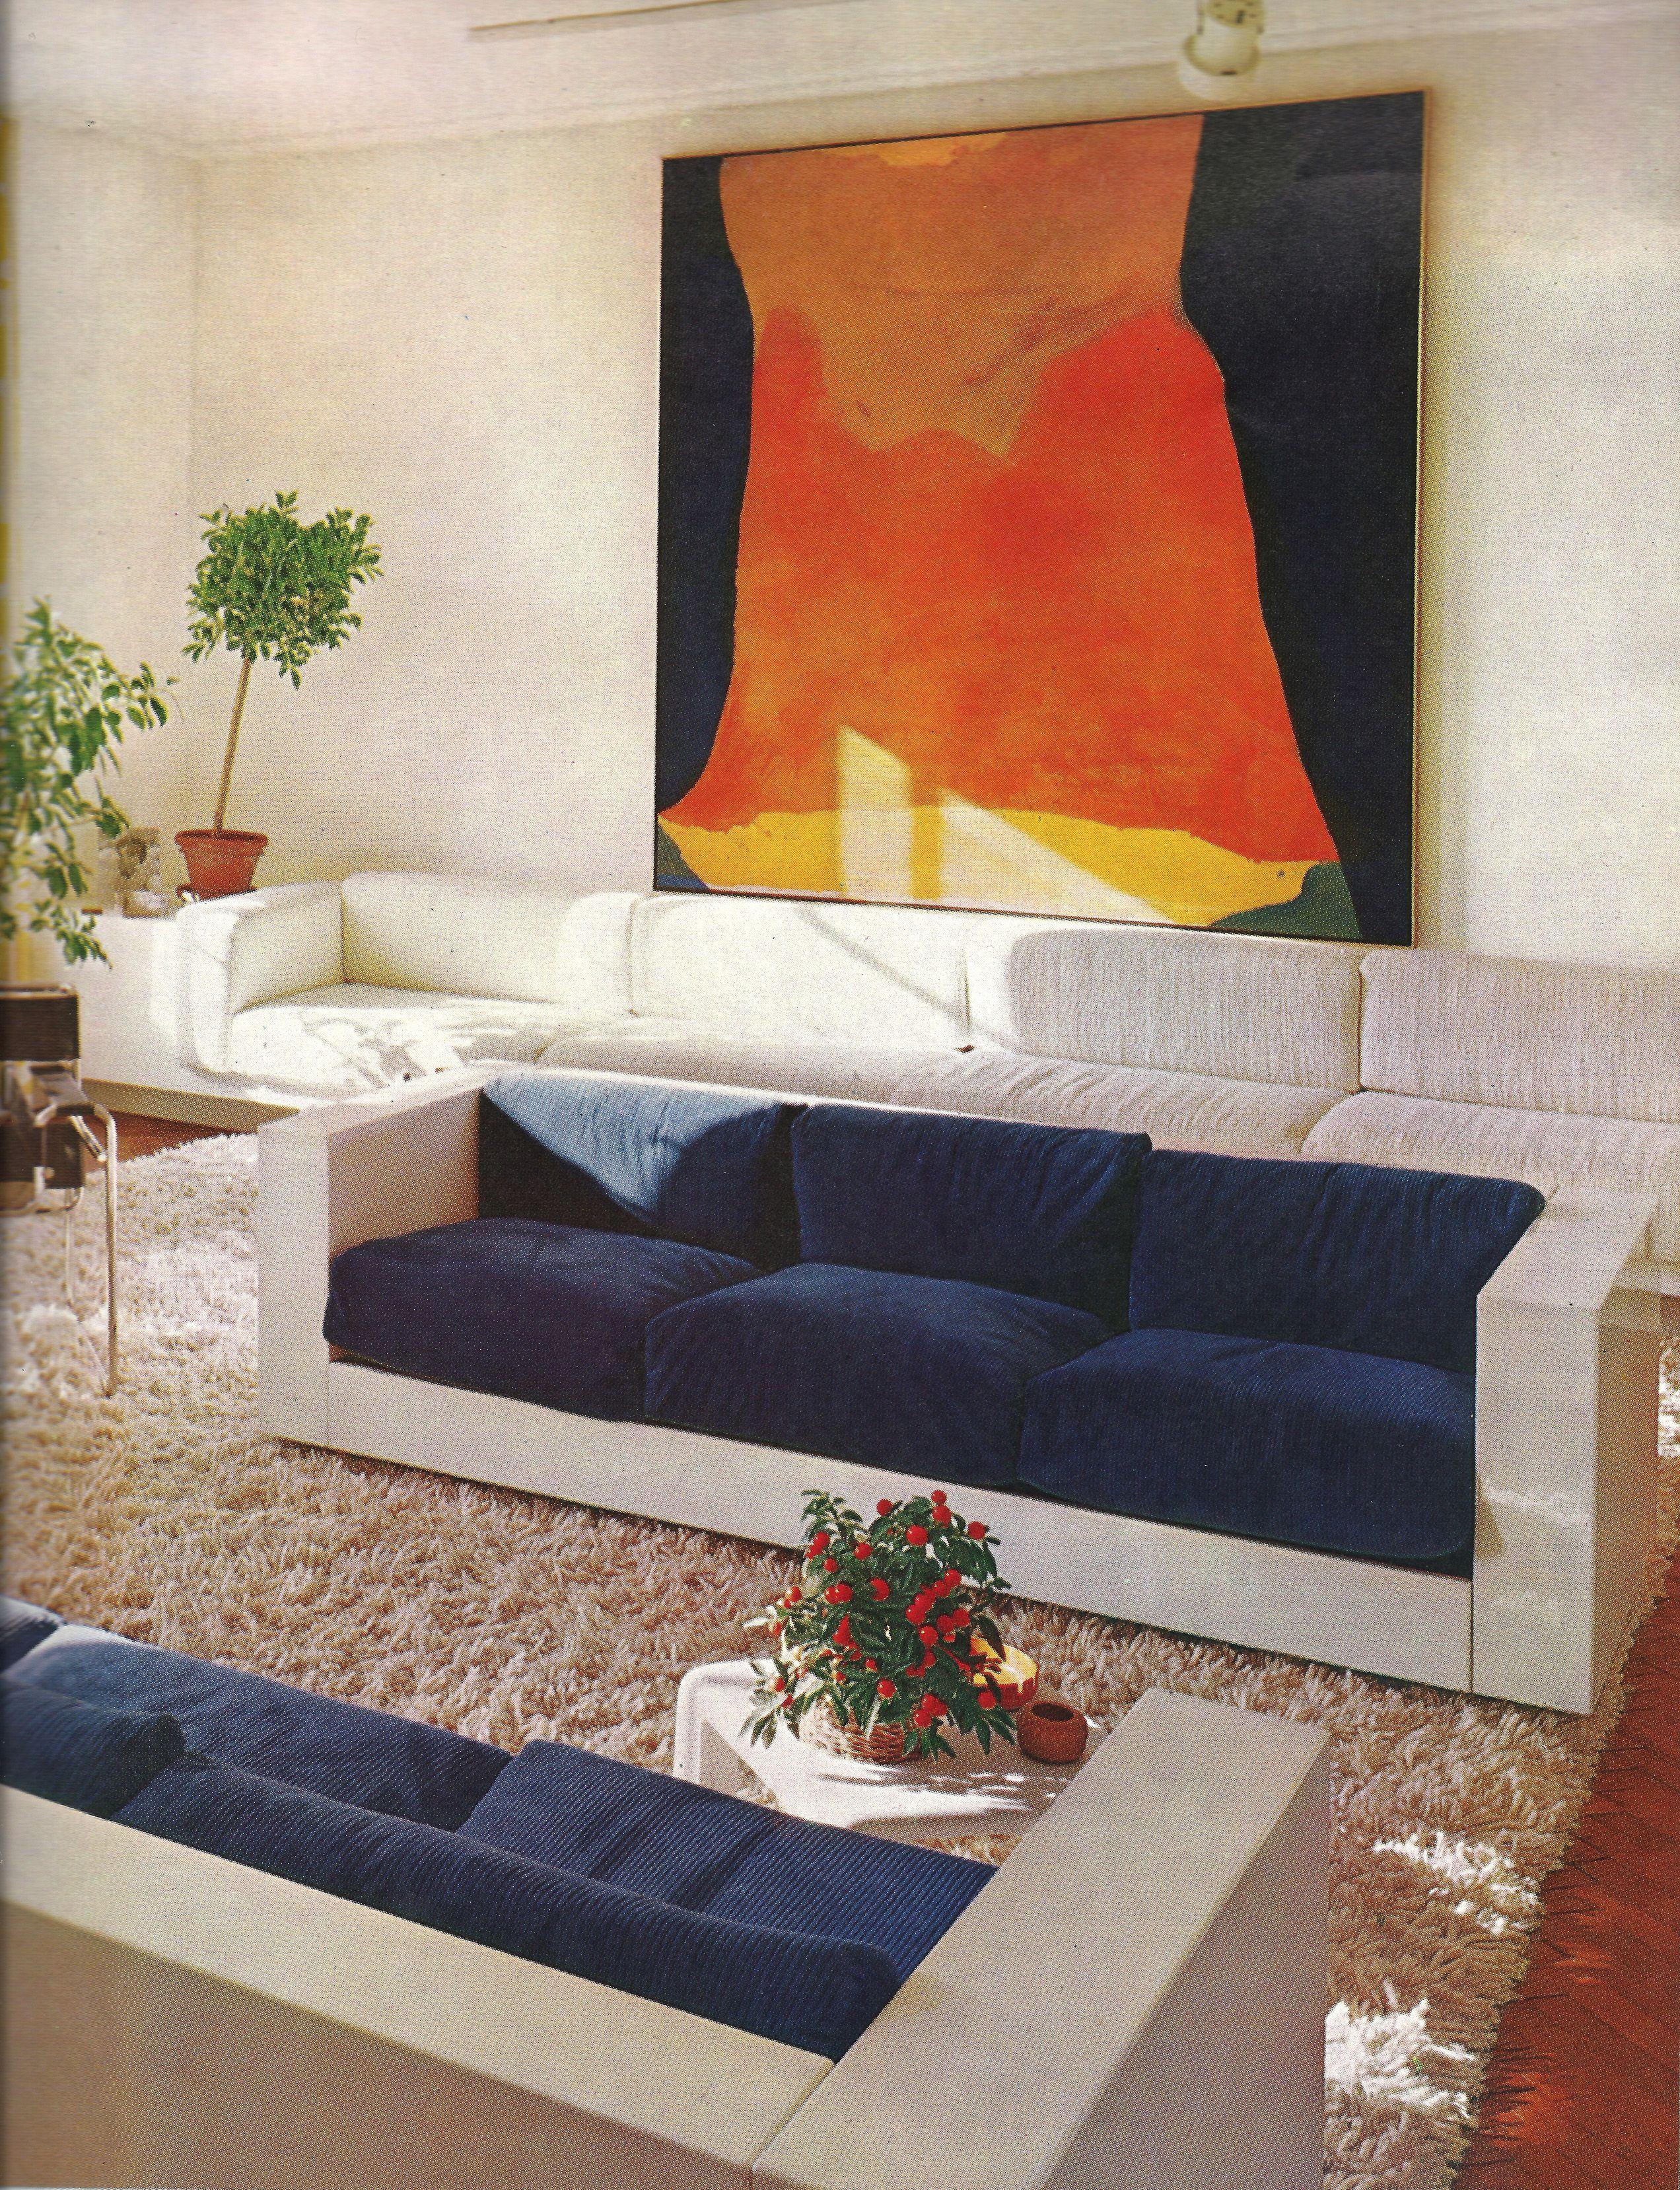 House garden 39 s complete guide to interior decoration for Garden design 1970s